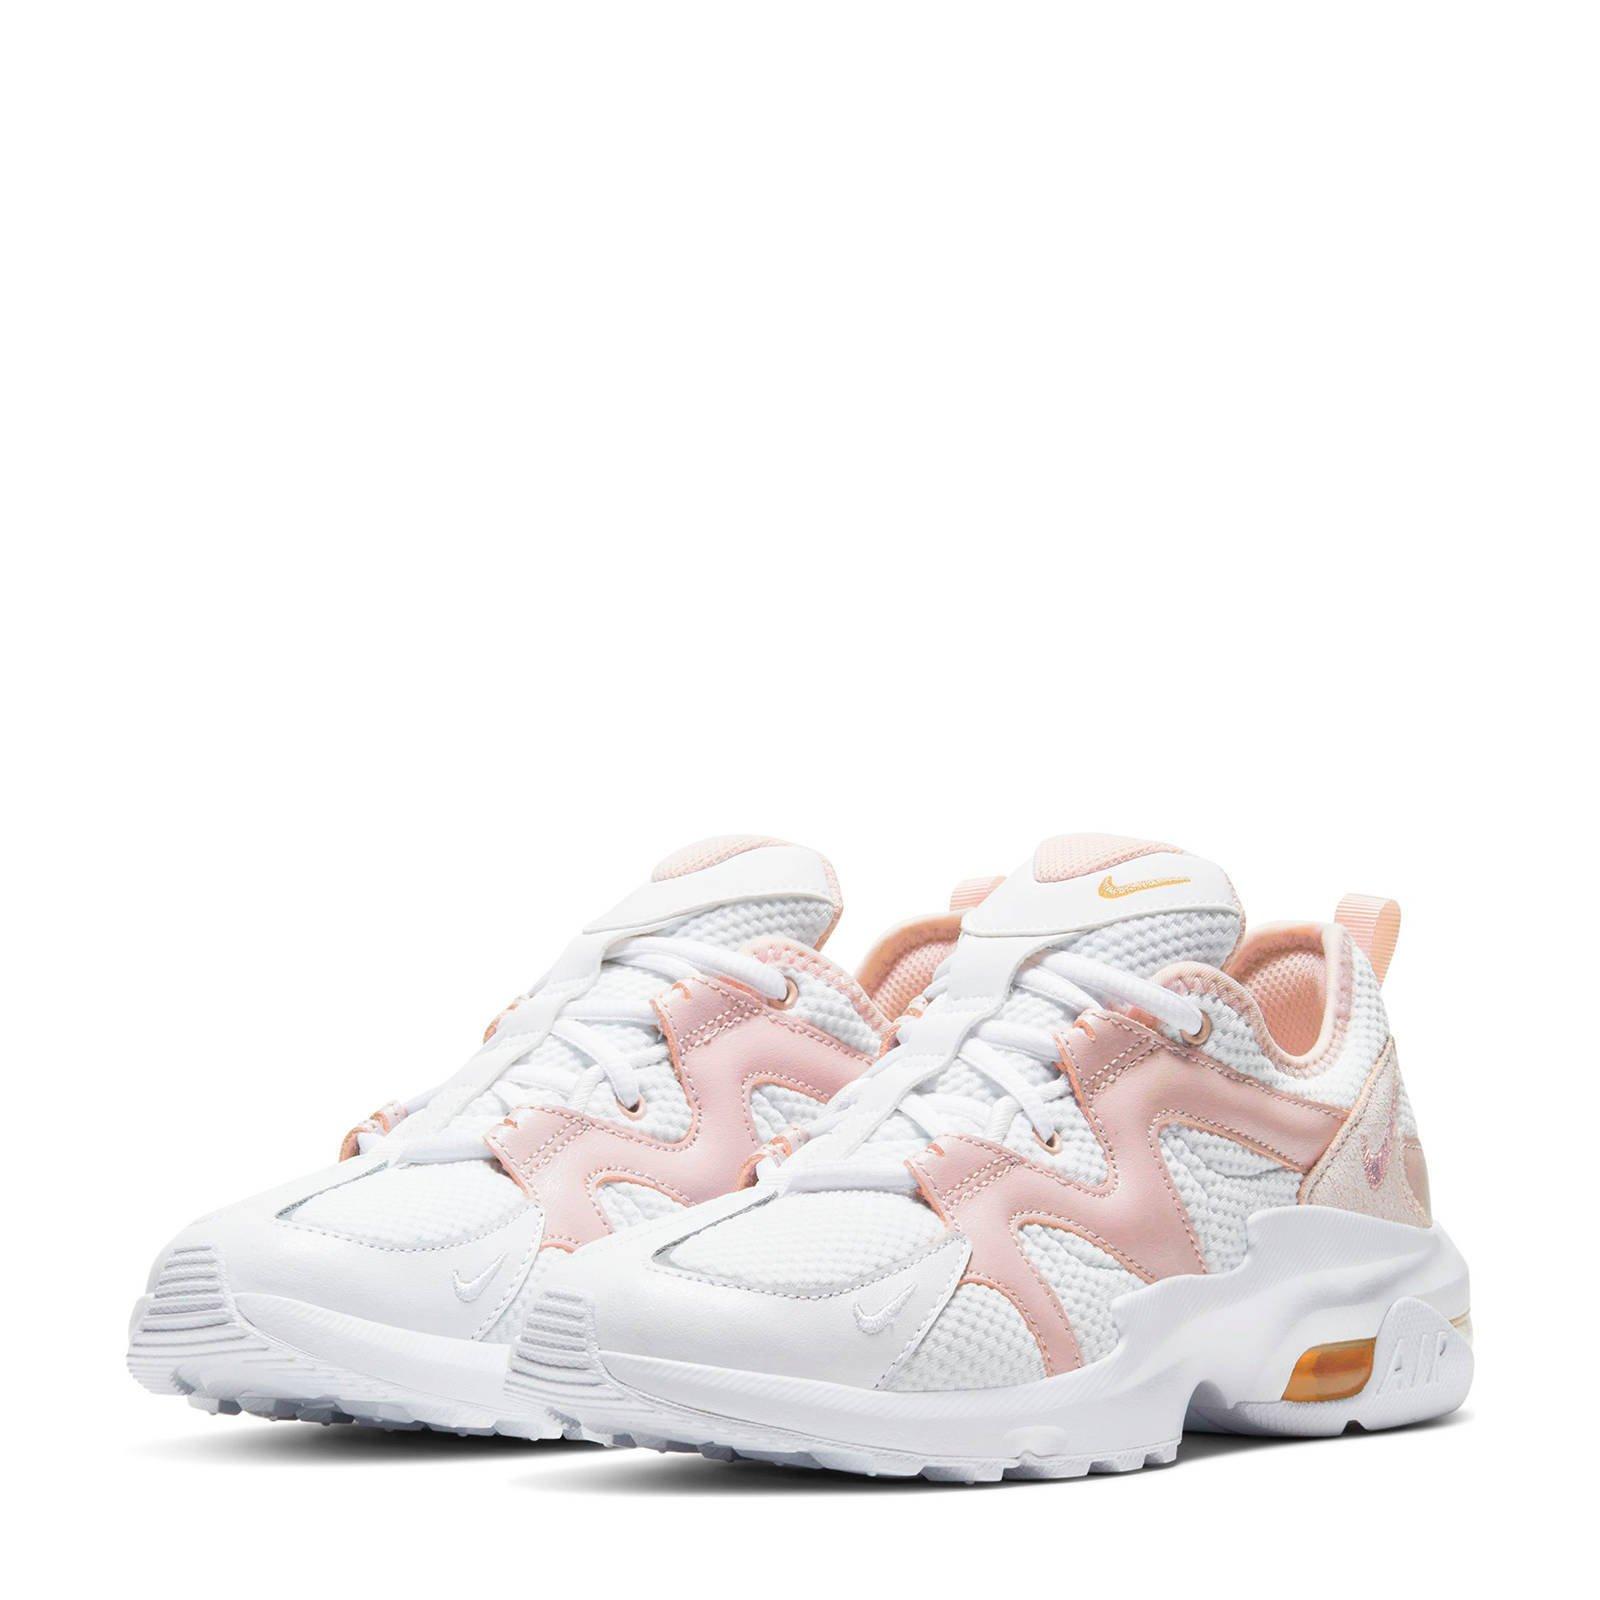 Air Max Graviton sneakers witlimegroen in 2020 Nike air